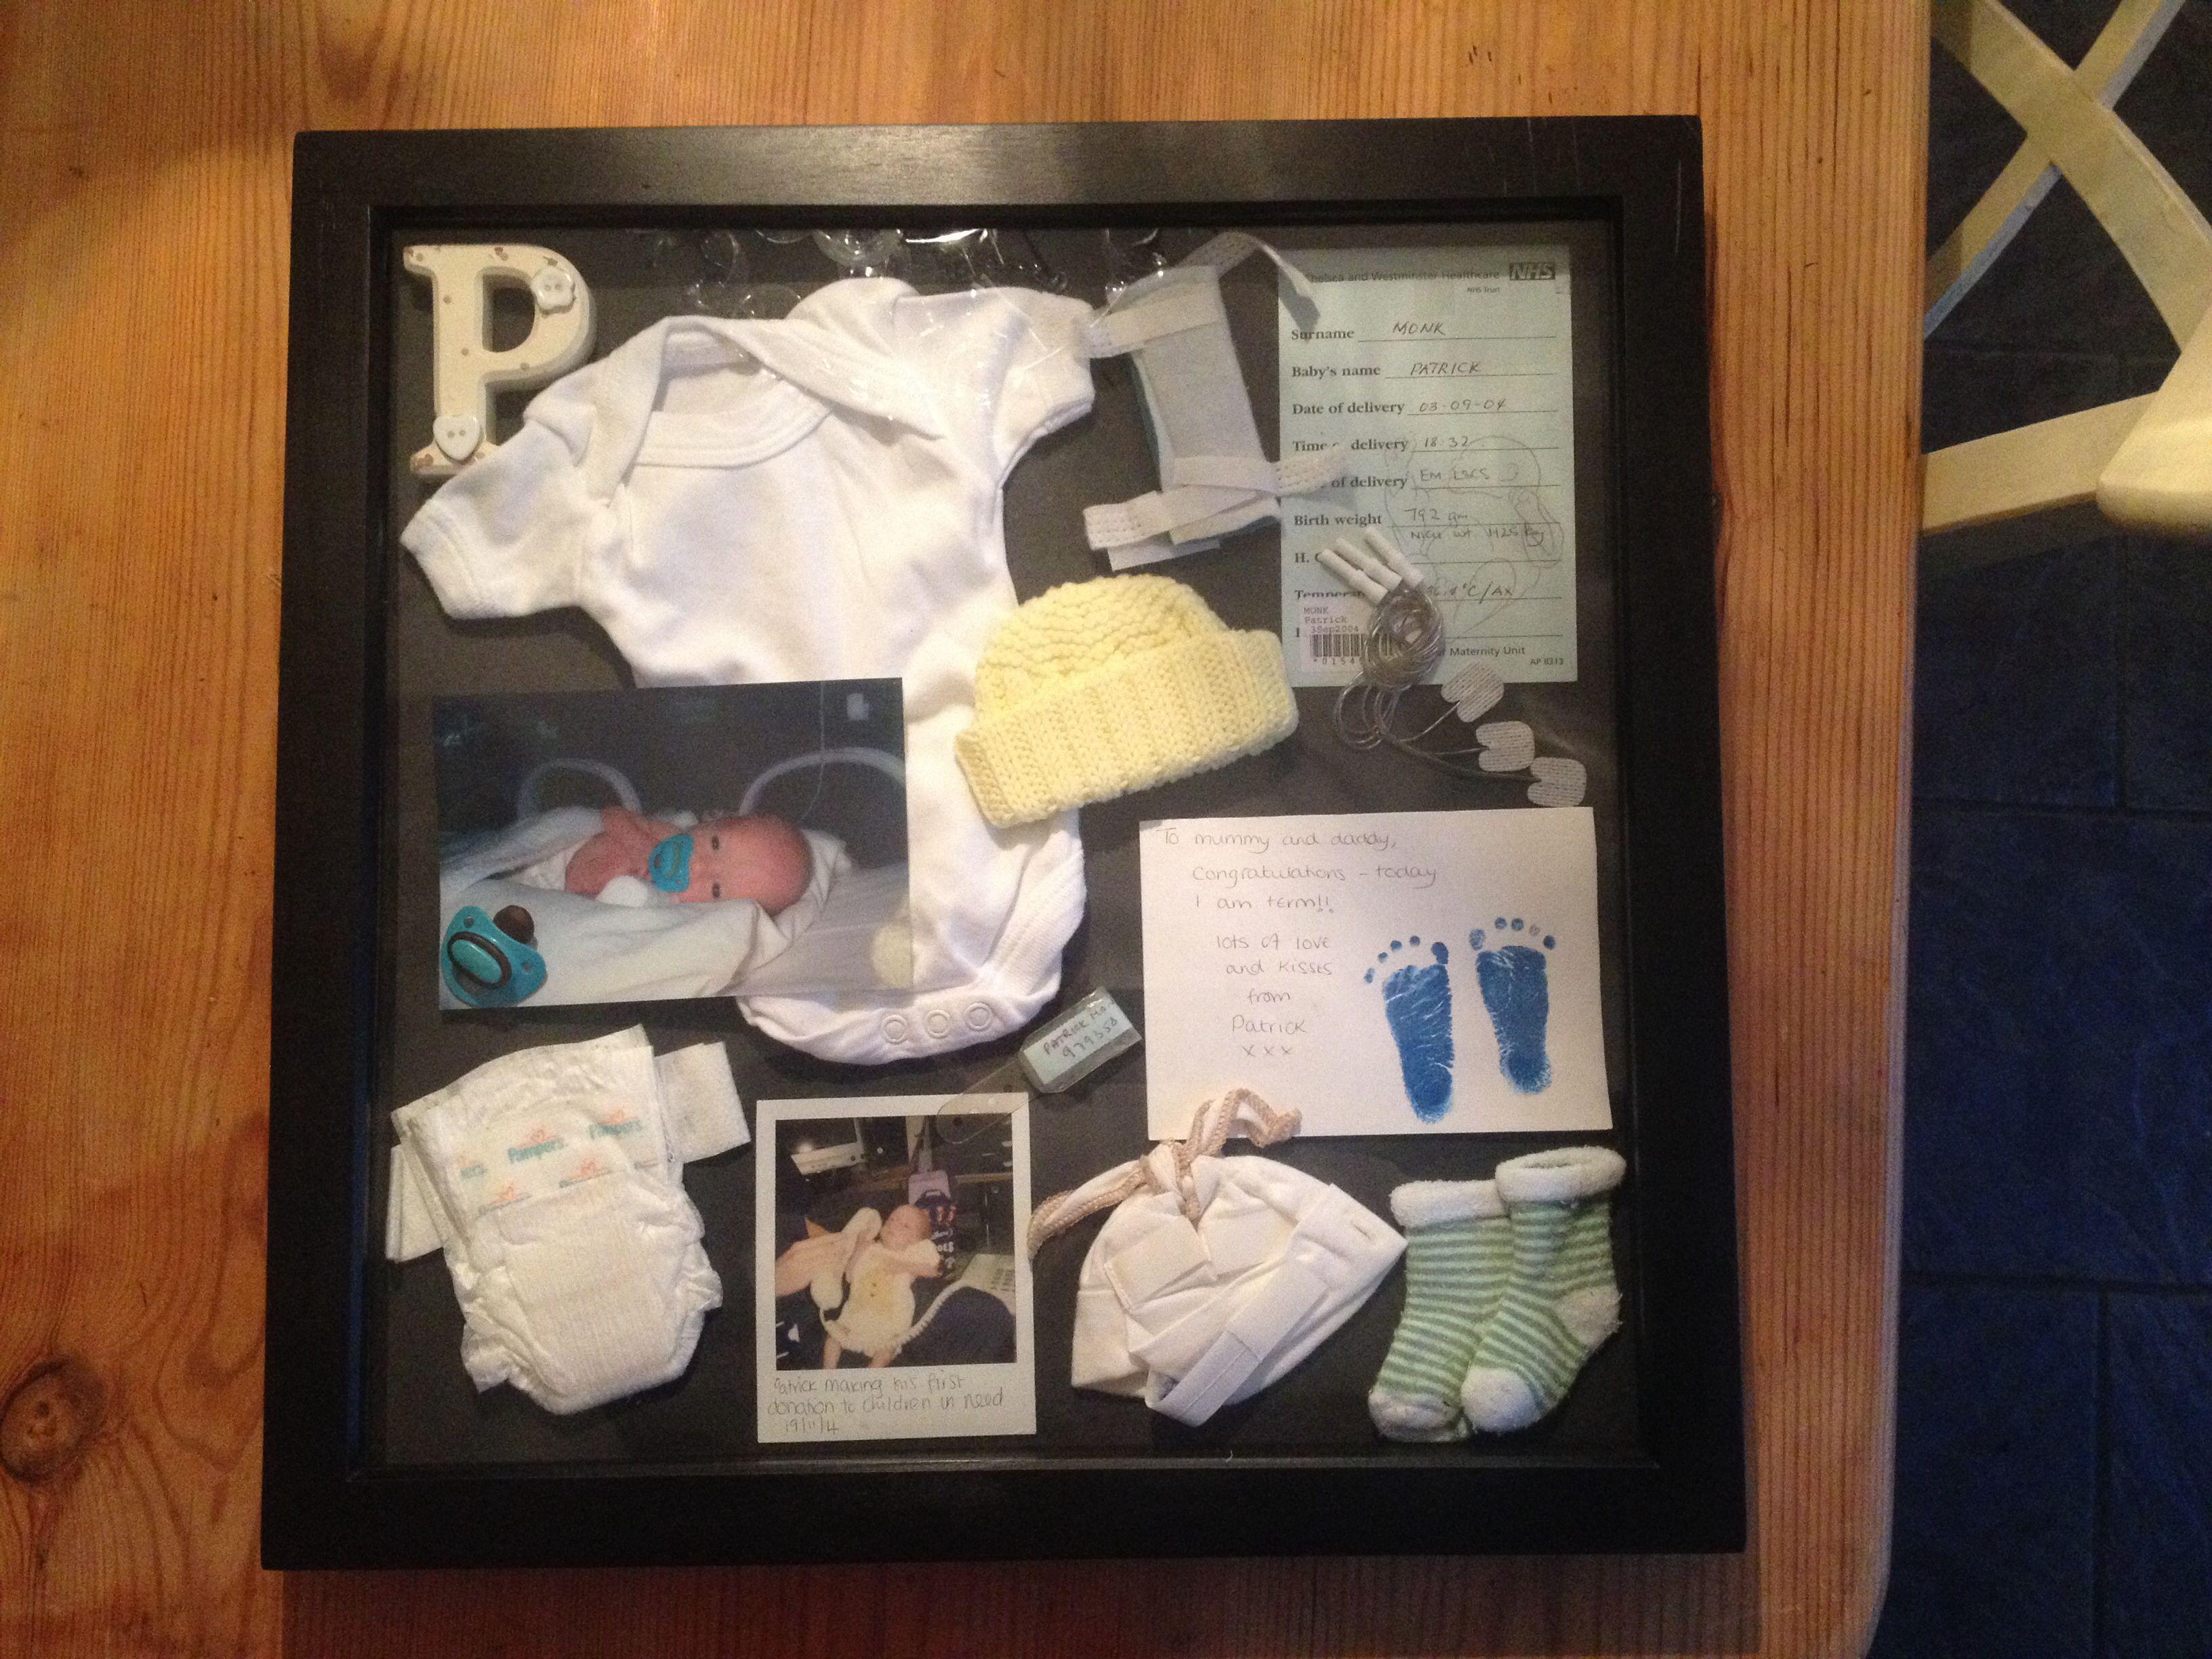 Memory box frame full of memorabilia from my son\'s time spent in the ...